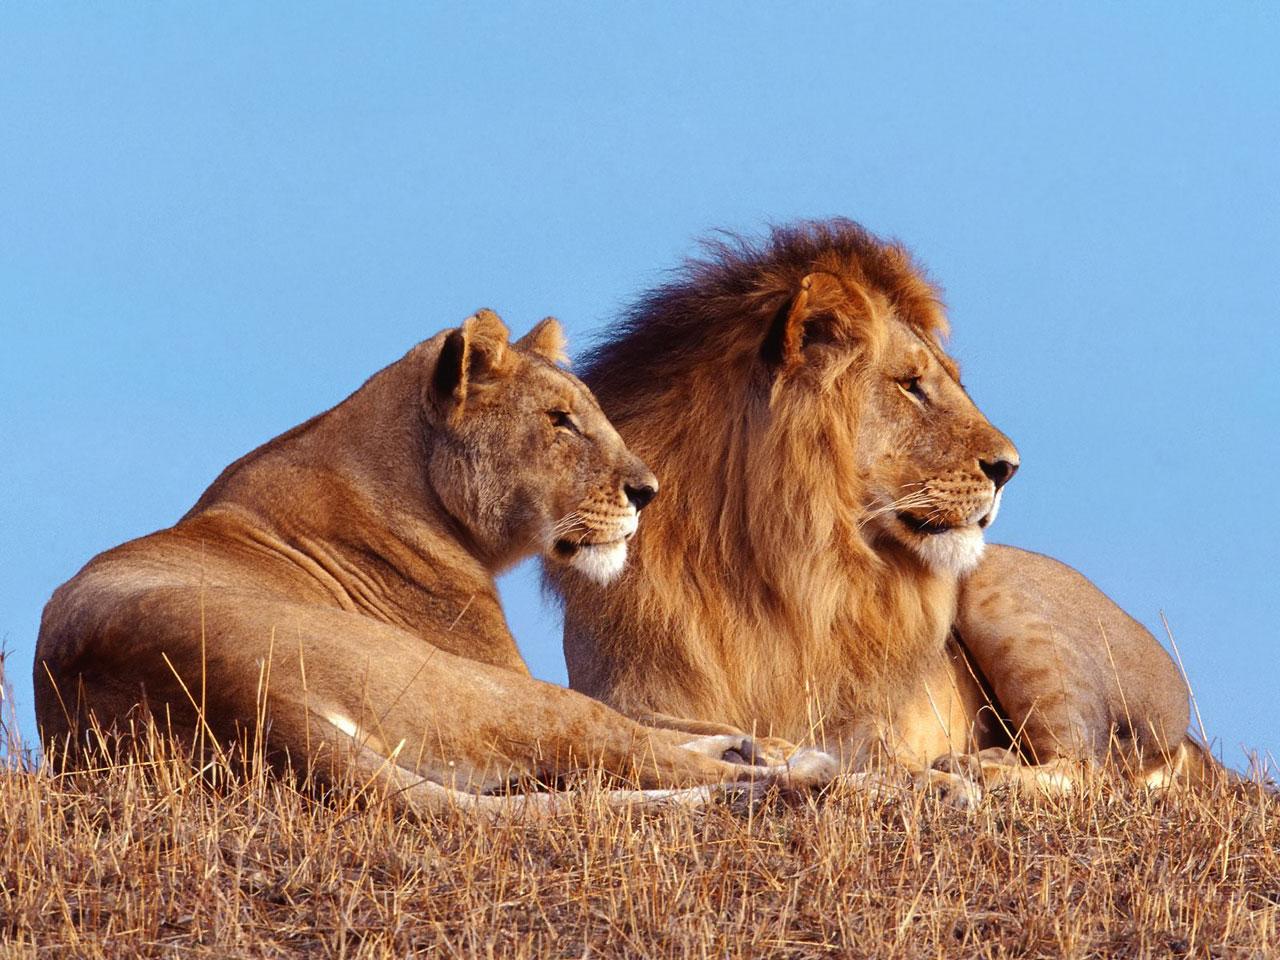 Dangerous hd lion wallpapers wild life - Lion wallpaper ...